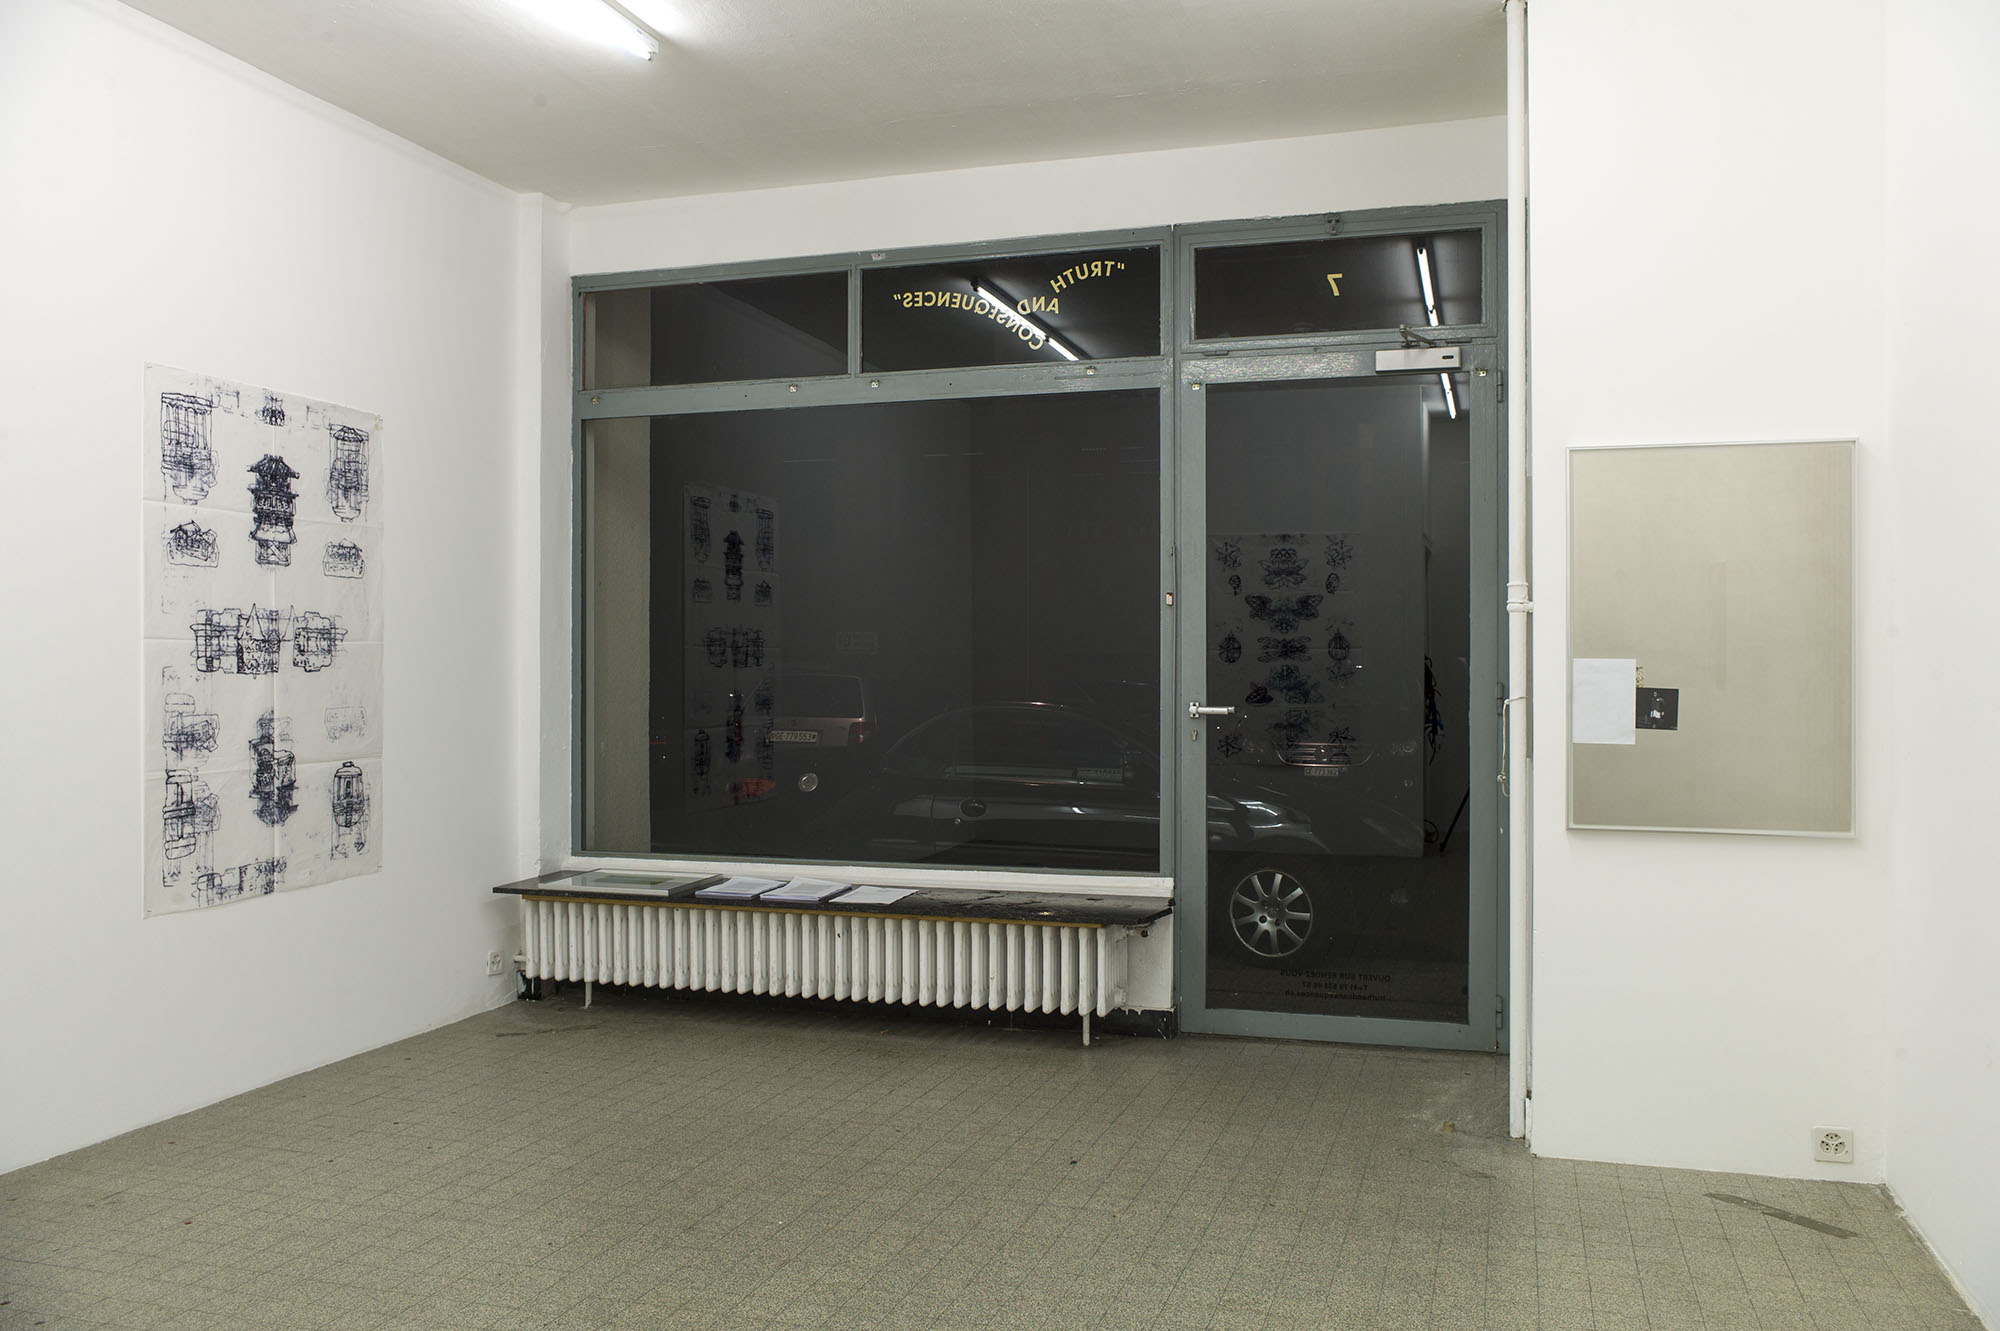 Lupo Borgonovo, Martin Widmer, WHOOSHH, Gallery Truth and Conseq